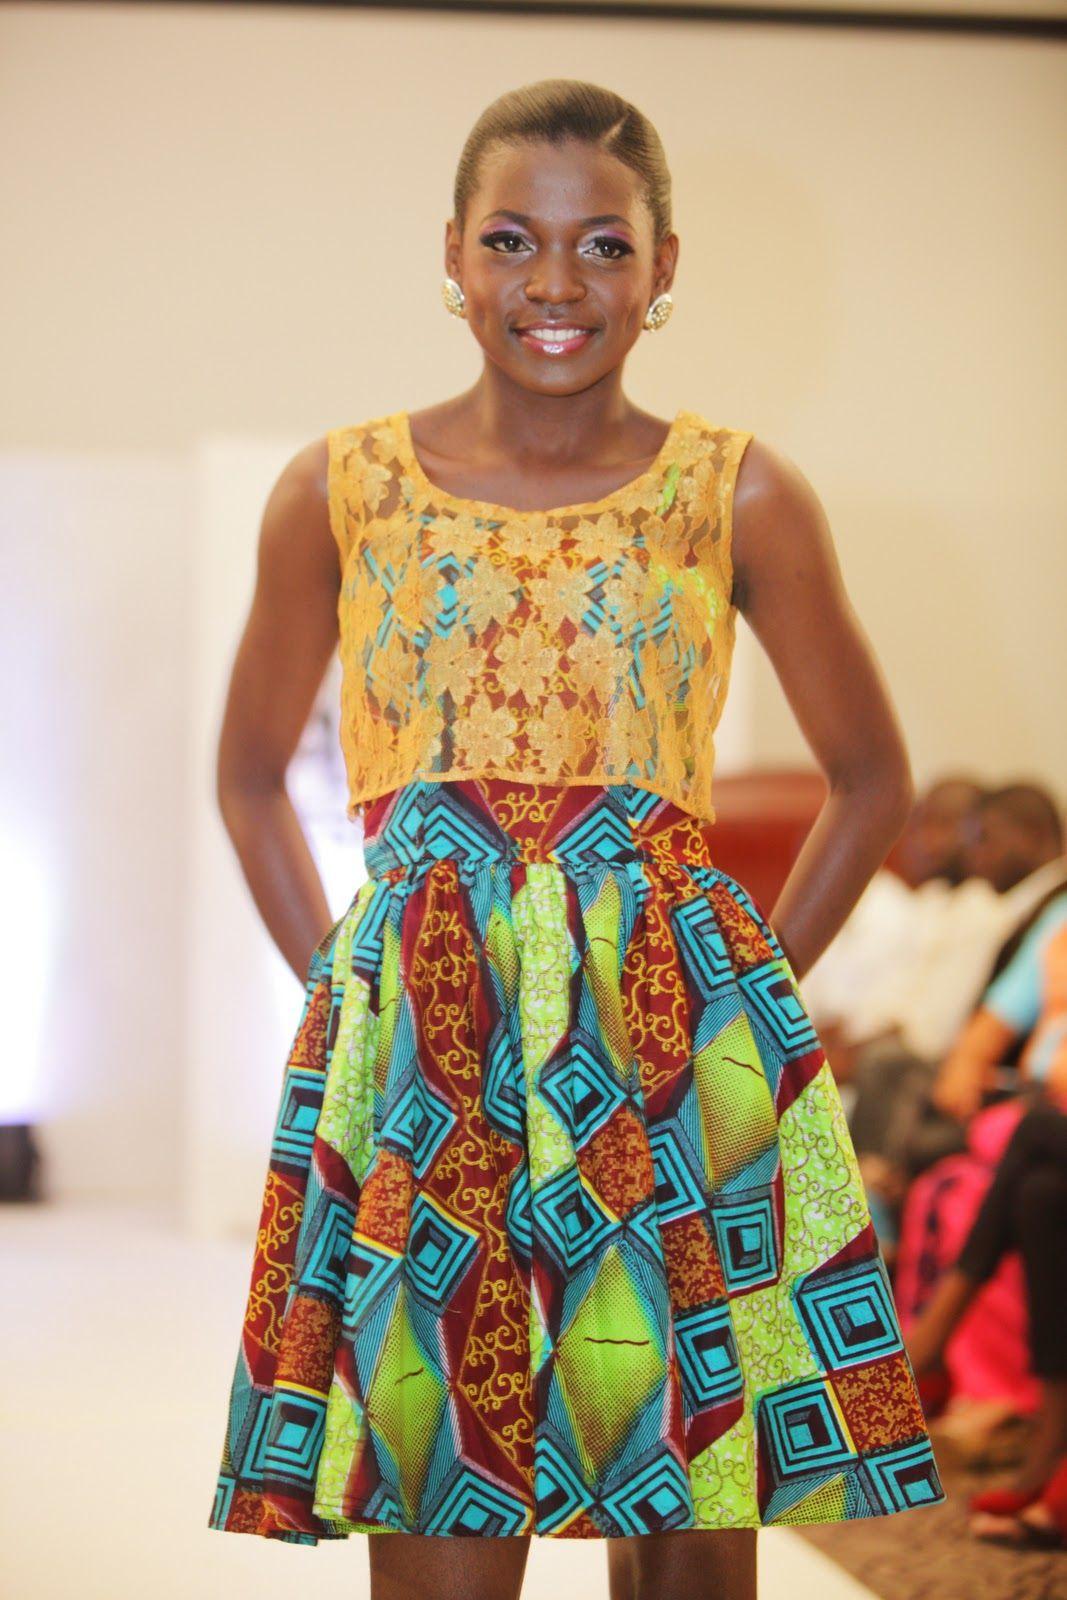 N'kya Designs. #Africanfashion #AfricanWeddings #Africanprints #Ethnicprints #Africanwomen #africanTradition #AfricanArt #AfricanStyle #AfricanBeads #Gele #Kente #Ankara #Nigerianfashion #Ghanaianfashion #Kenyanfashion #Burundifashion #senegalesefashion #Swahilifashion DKK